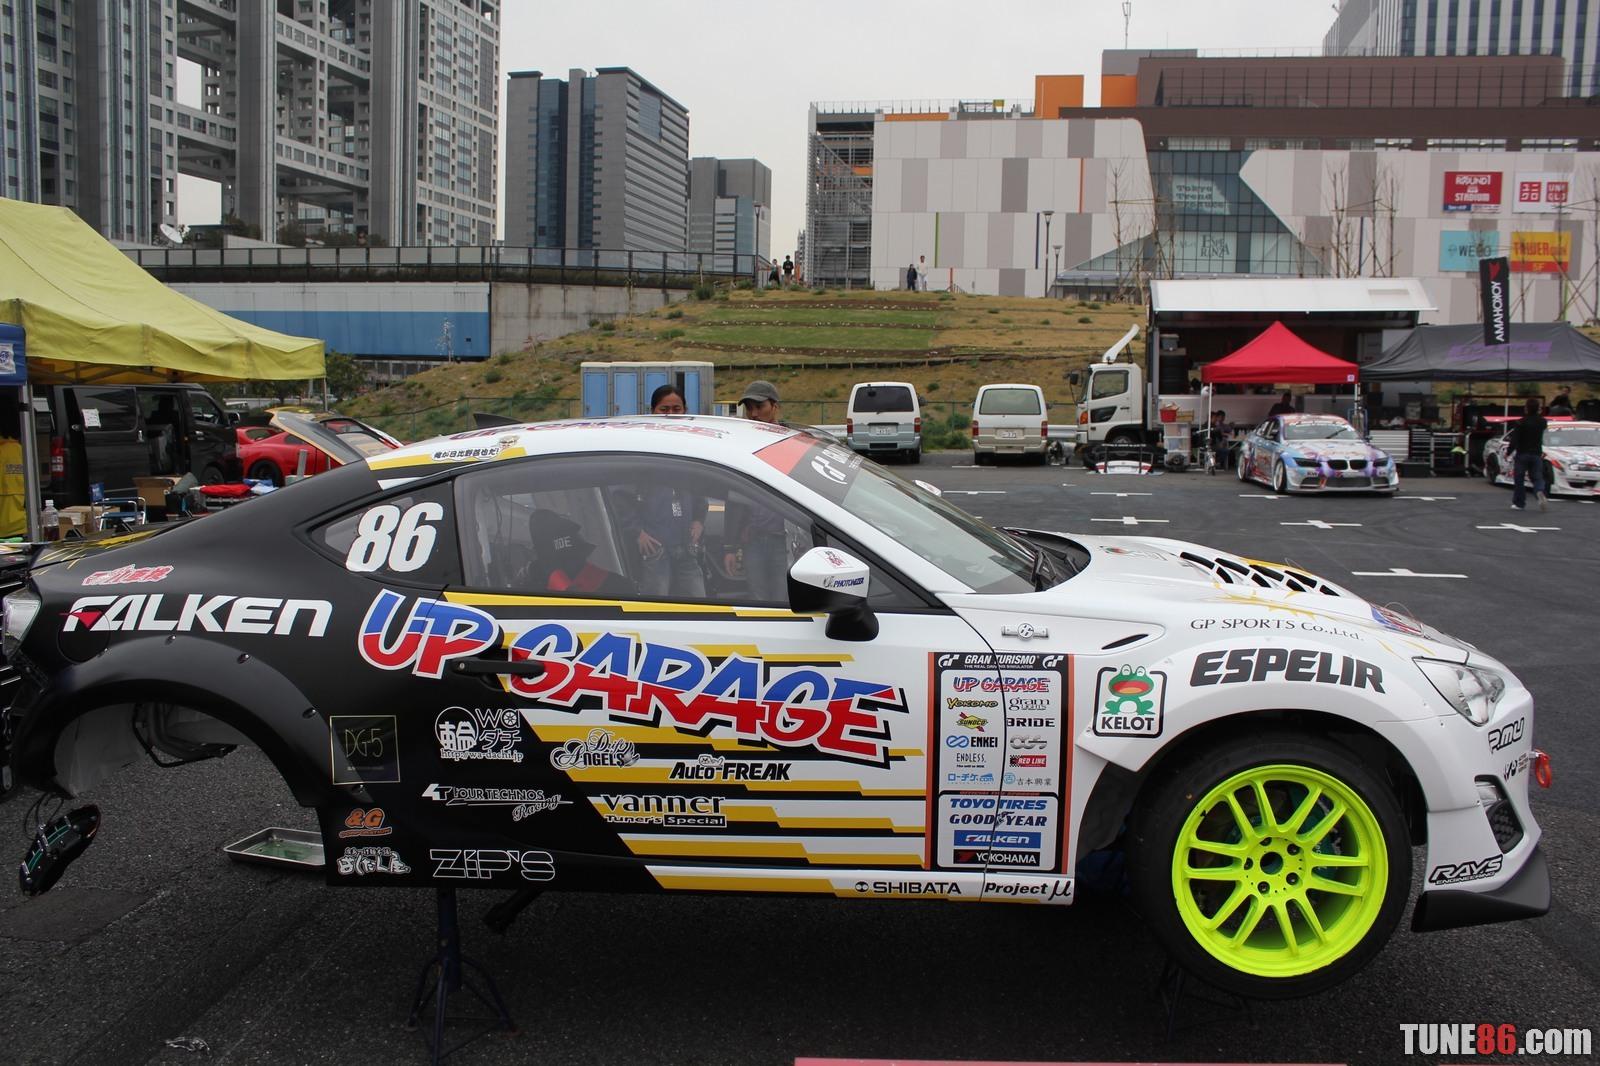 Toyota 86 d1gp Odaiba tokyo drift 19 DRoop Hibino Upgarage